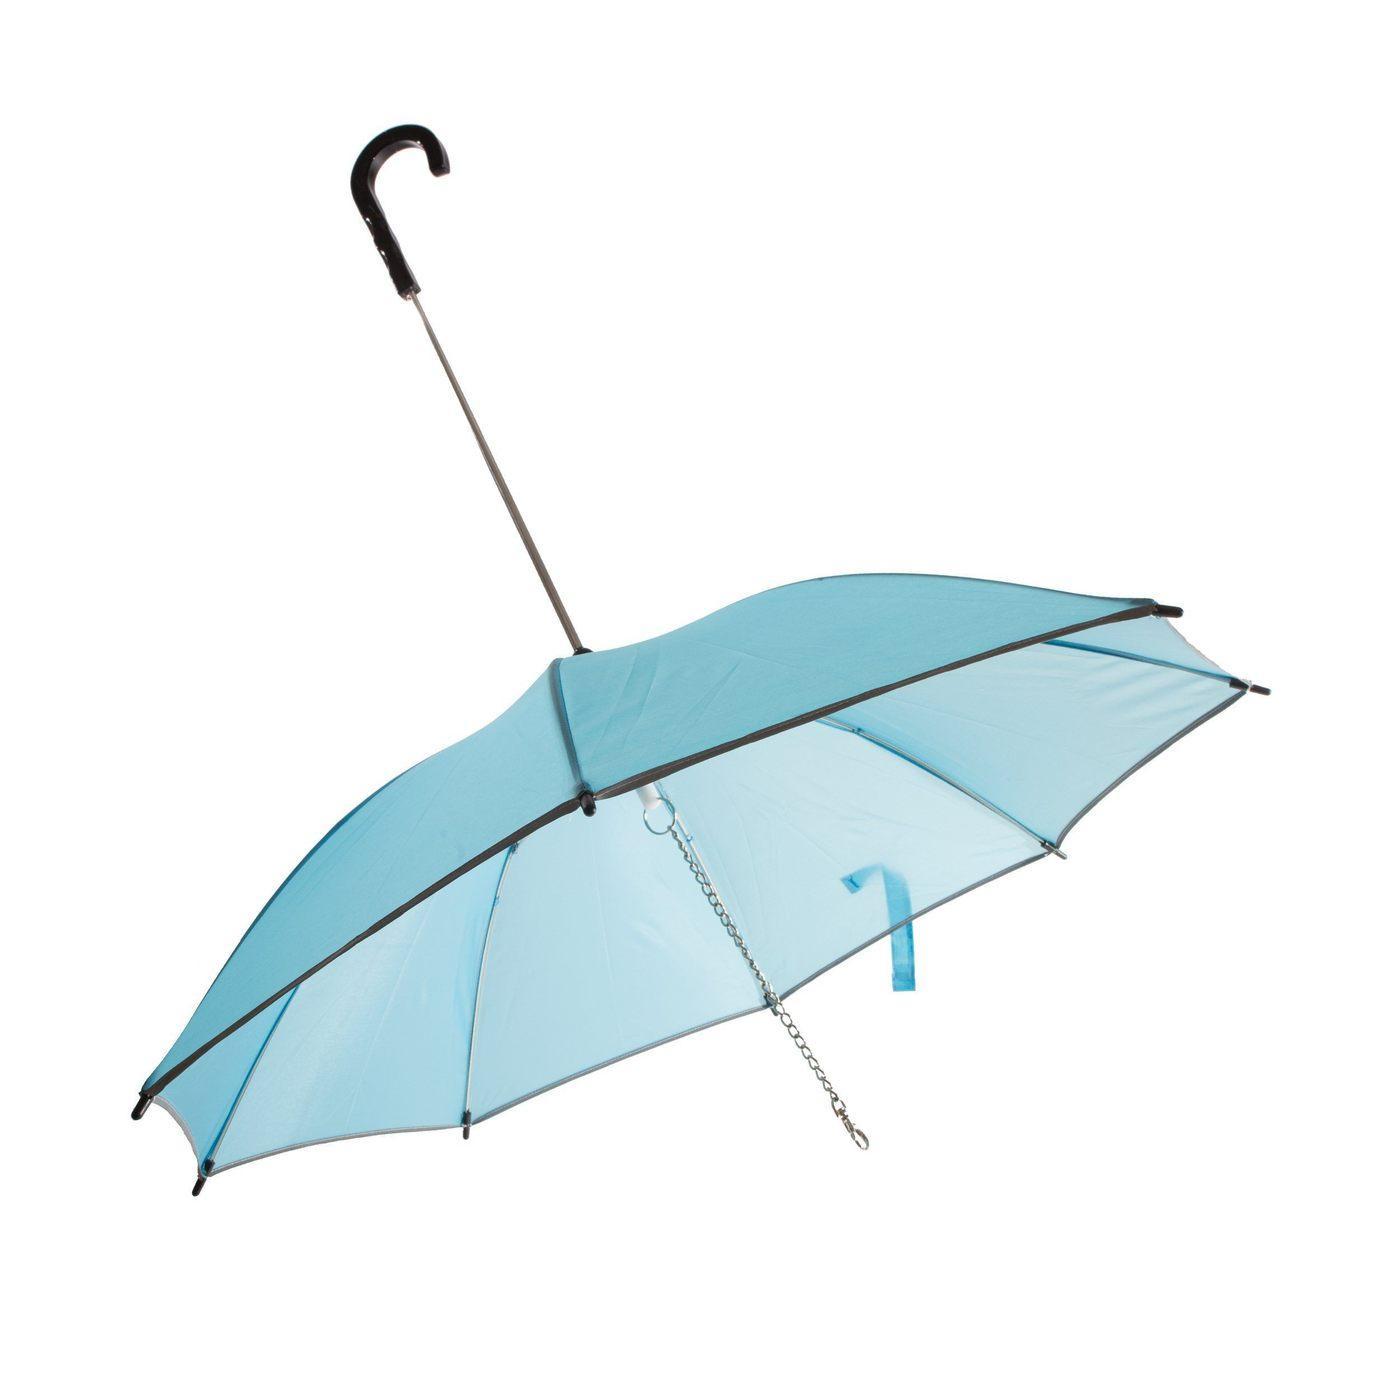 Pet Life 'Pour-Protection' Performance Dog Umbrella - Light Blue with Black Handle